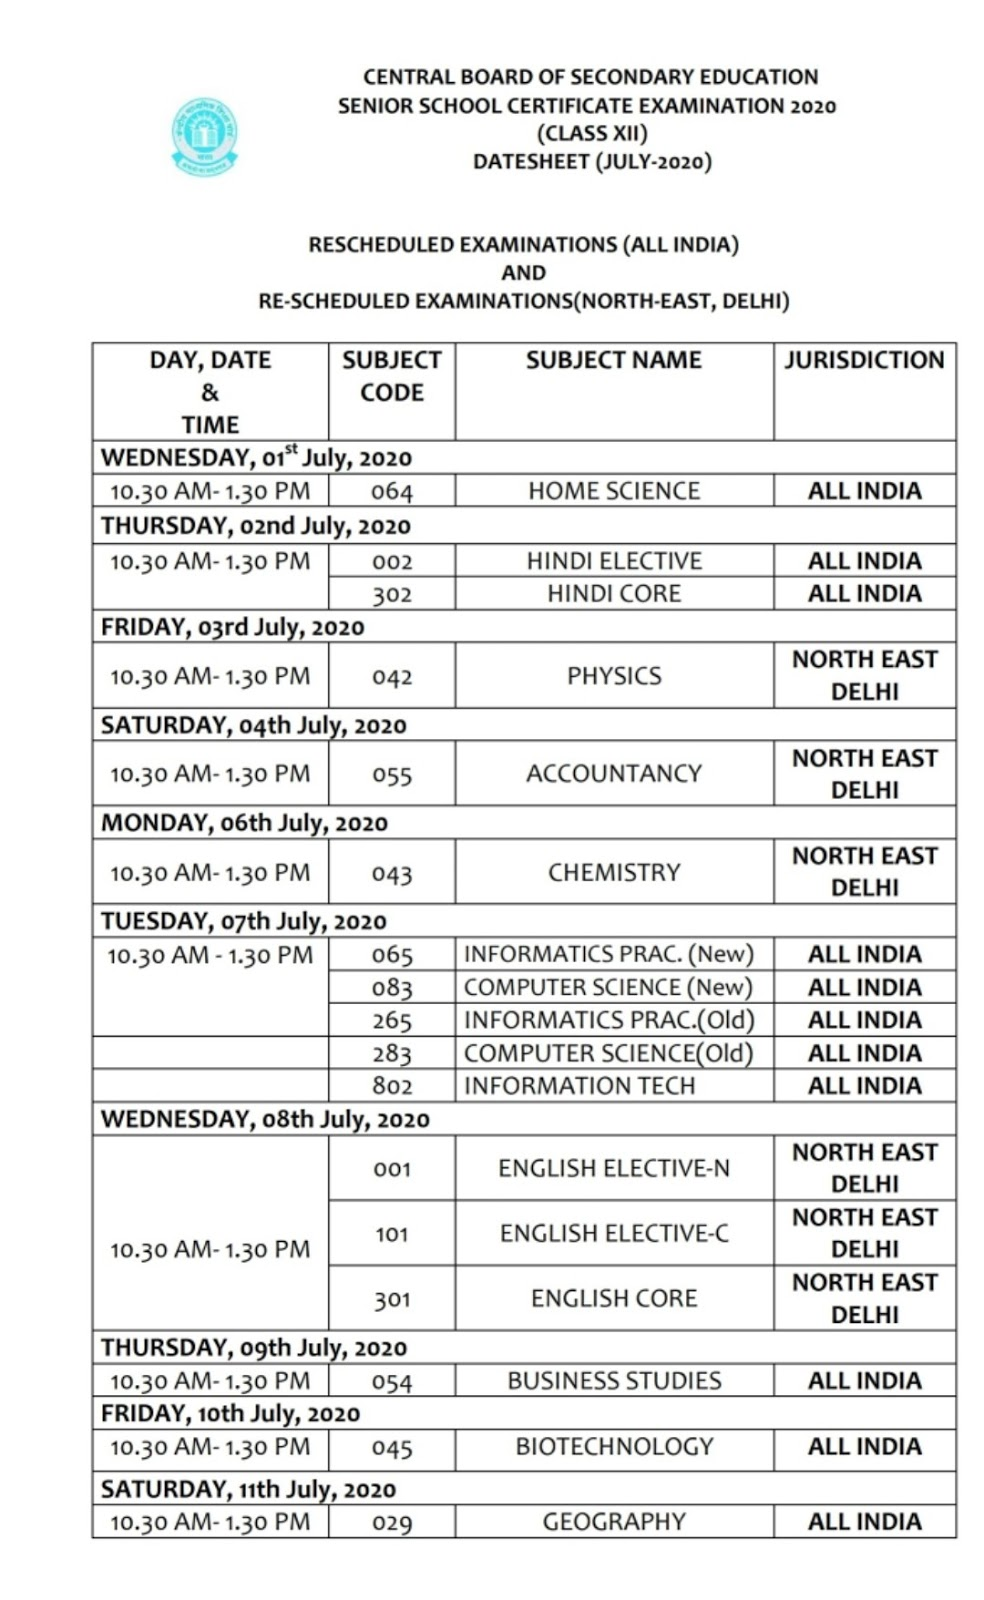 CBSE Board Class 10, 12 Exam Date Sheet 2020 Revised Schedule